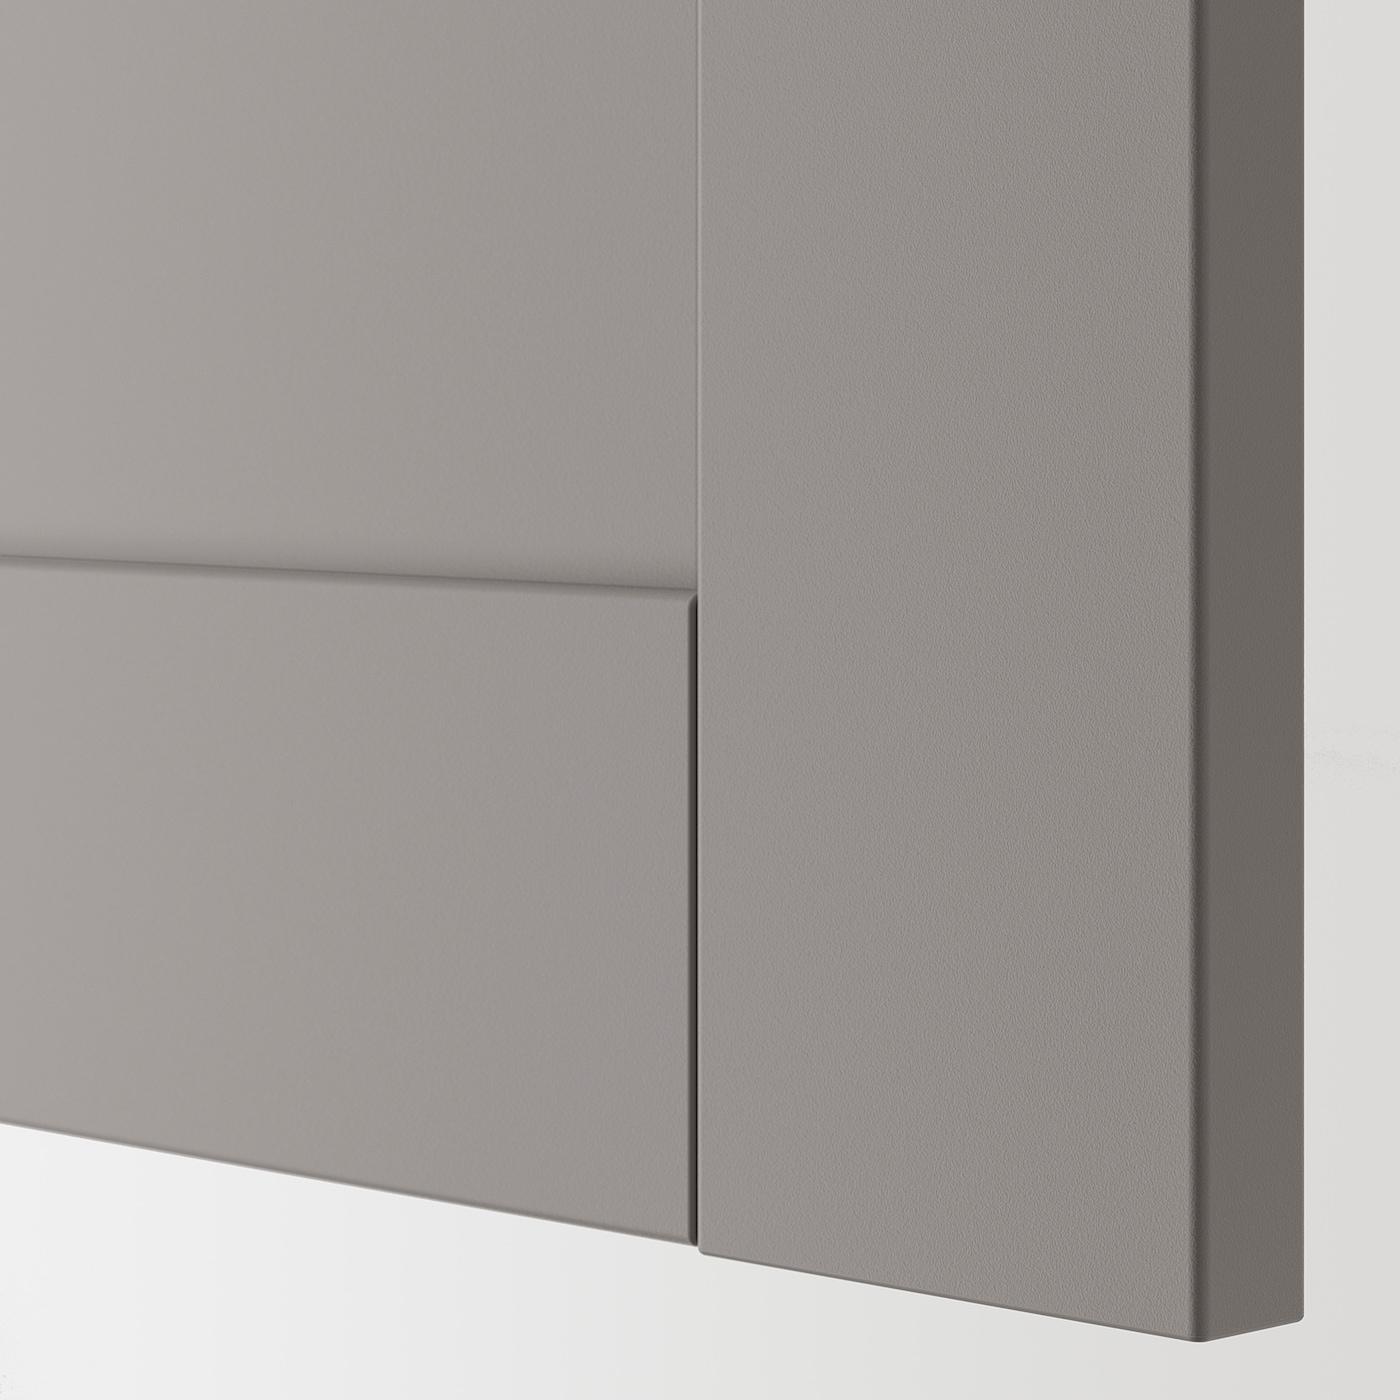 ENHET Wall cb w 2 shlvs/door, white/grey frame, 60x30x75 cm